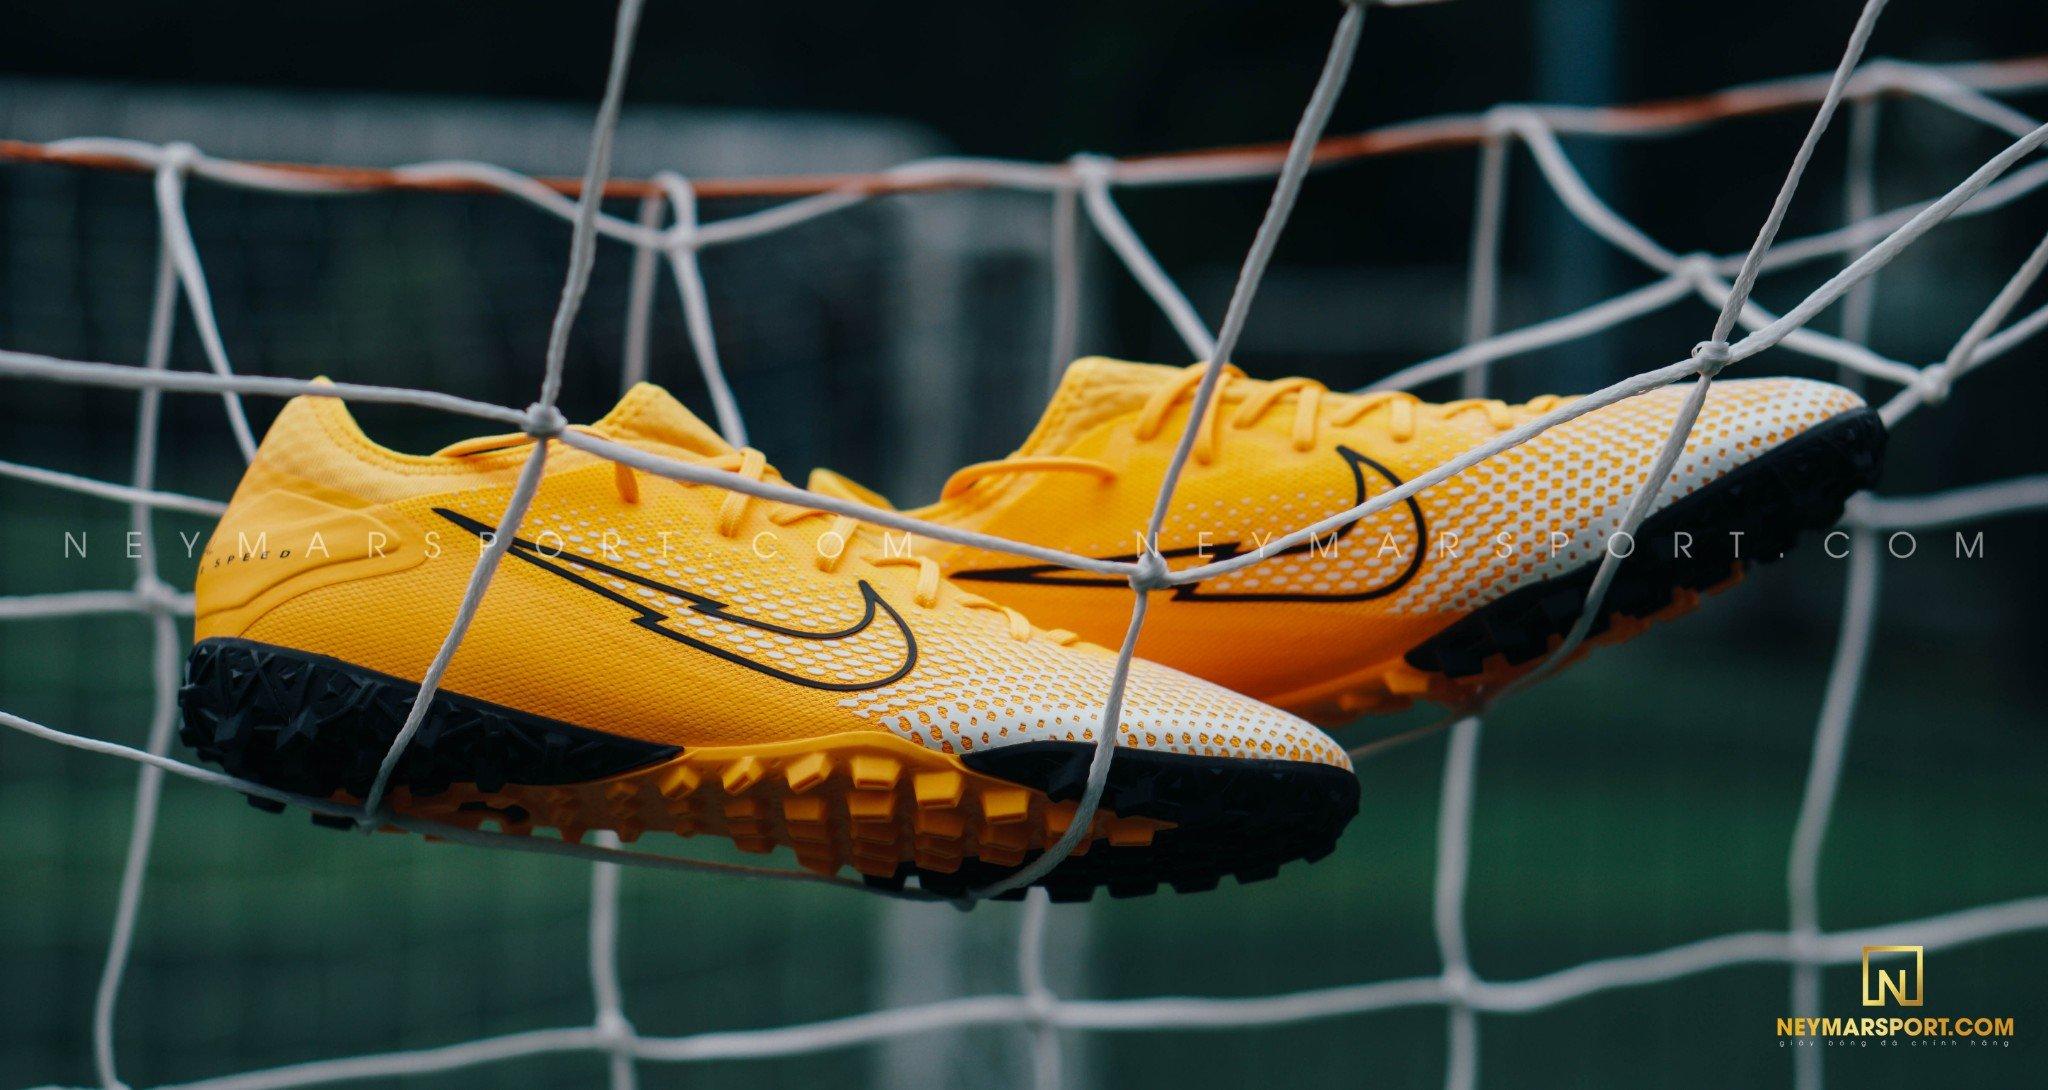 Giày cỏ nhân tạo Nike Mercurial Vapor 13 Pro TF Daybreak